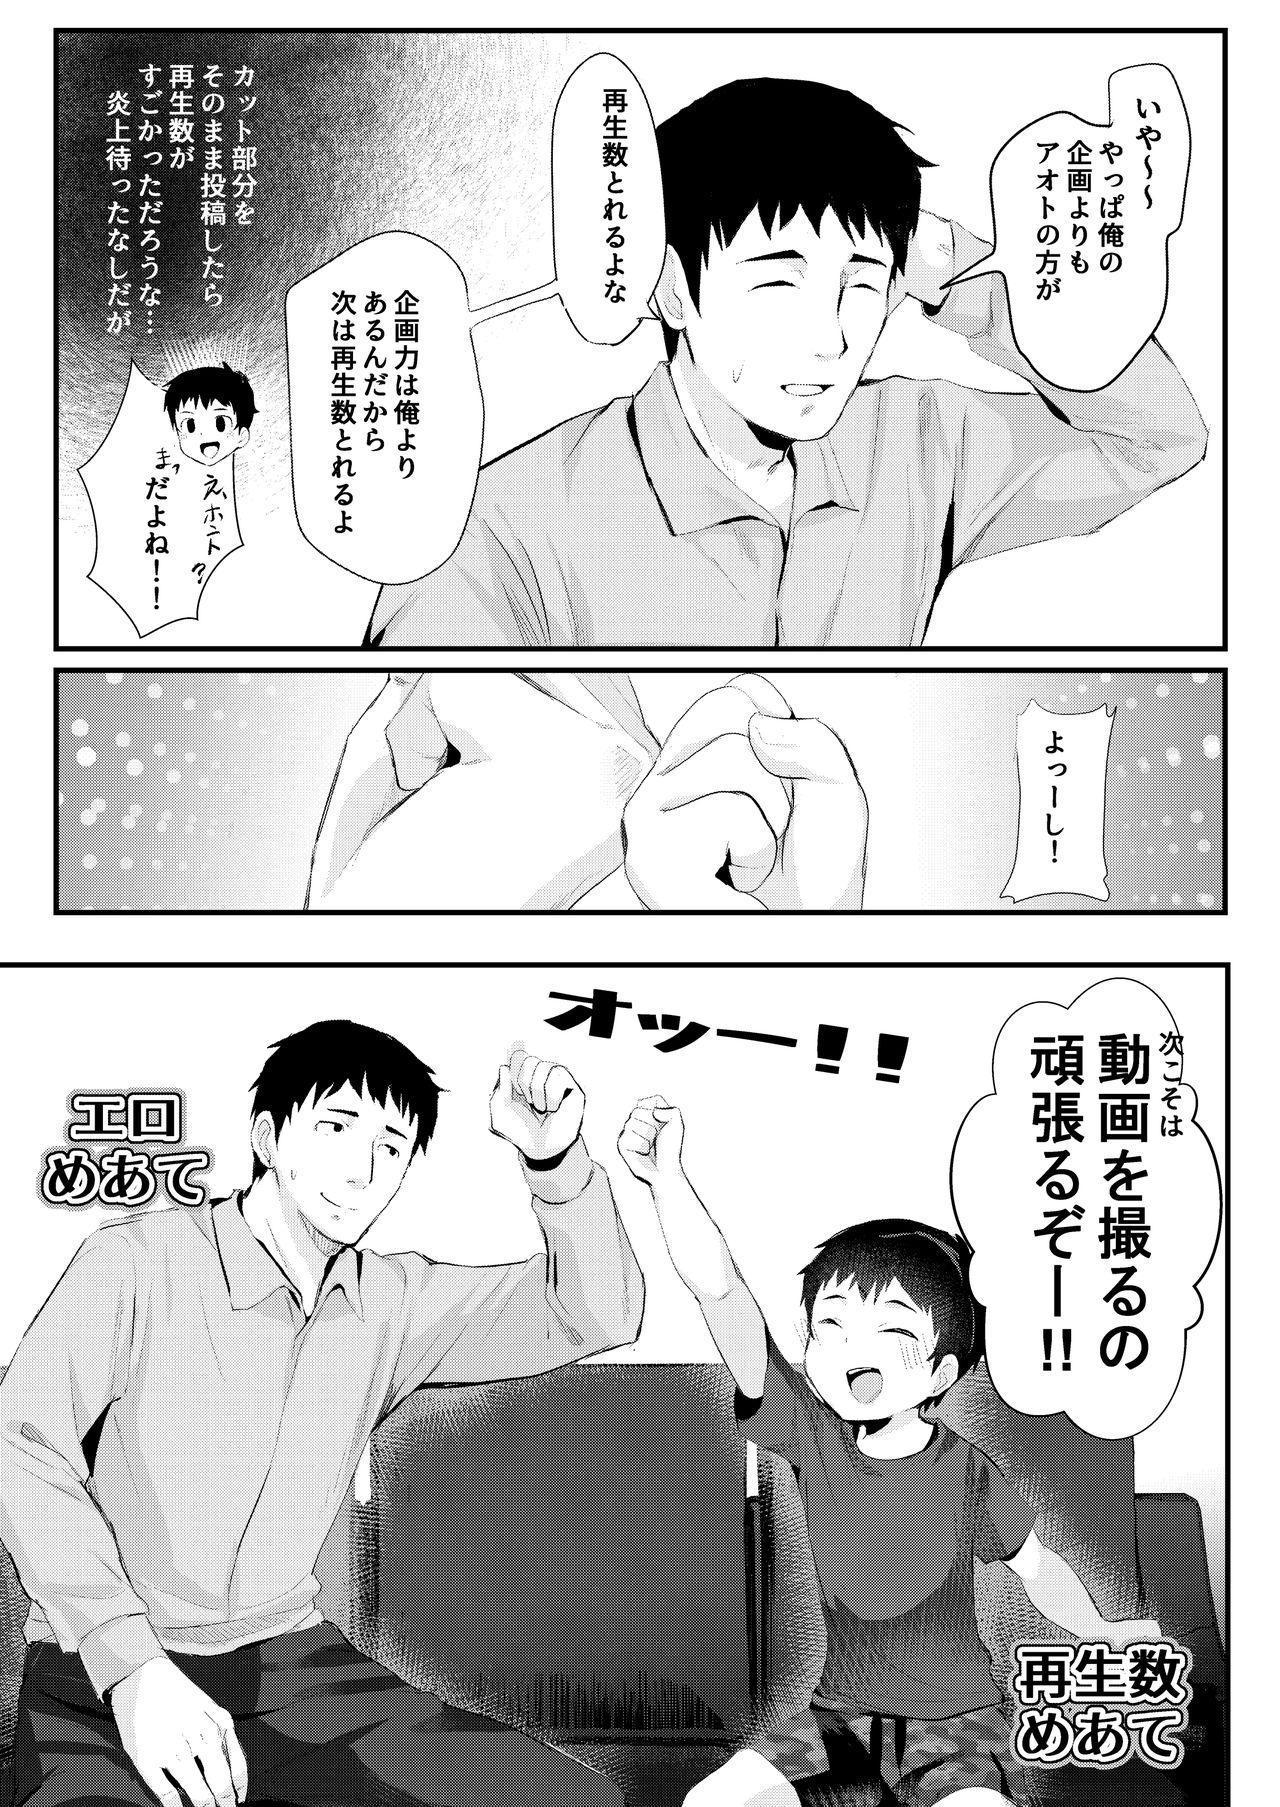 Dokidoki Dougazukuri! 27